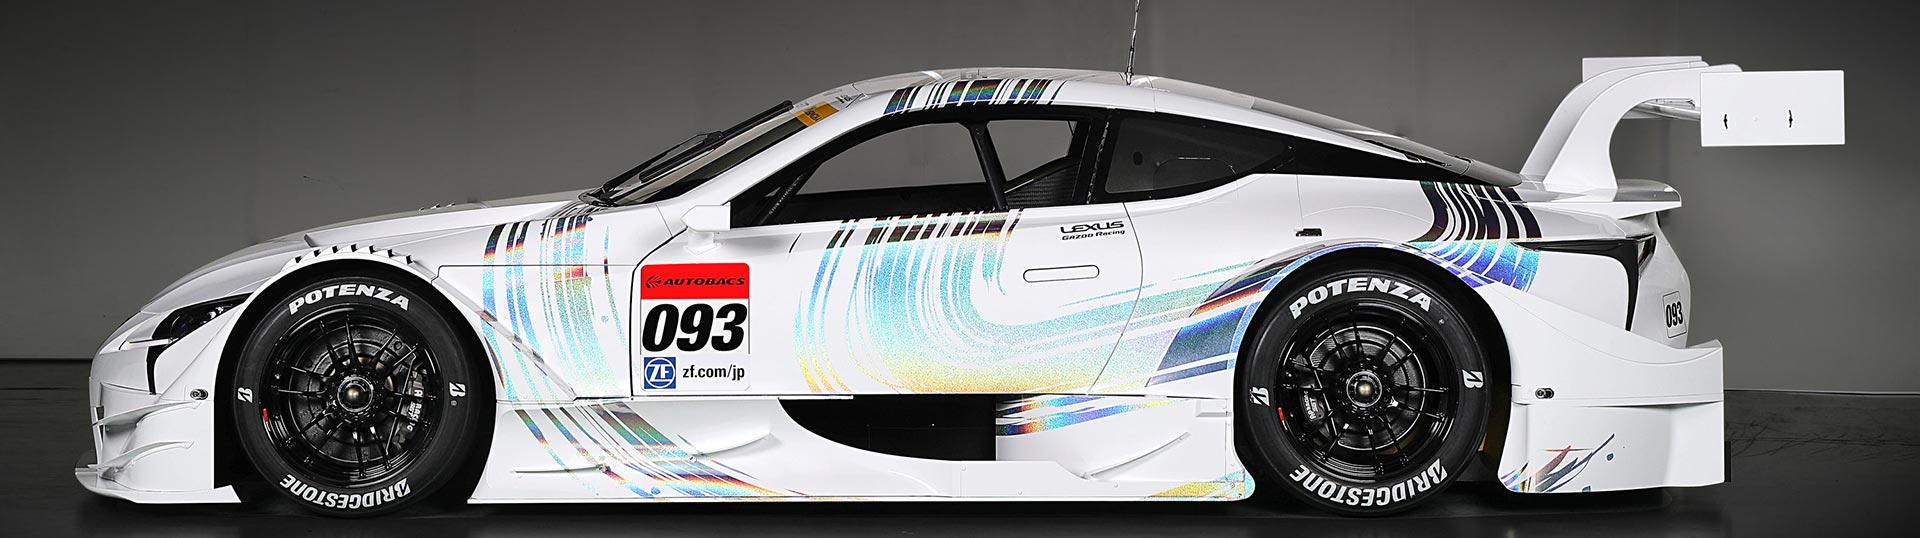 LC 500 é arma da Lexus para o Super GT de 2017